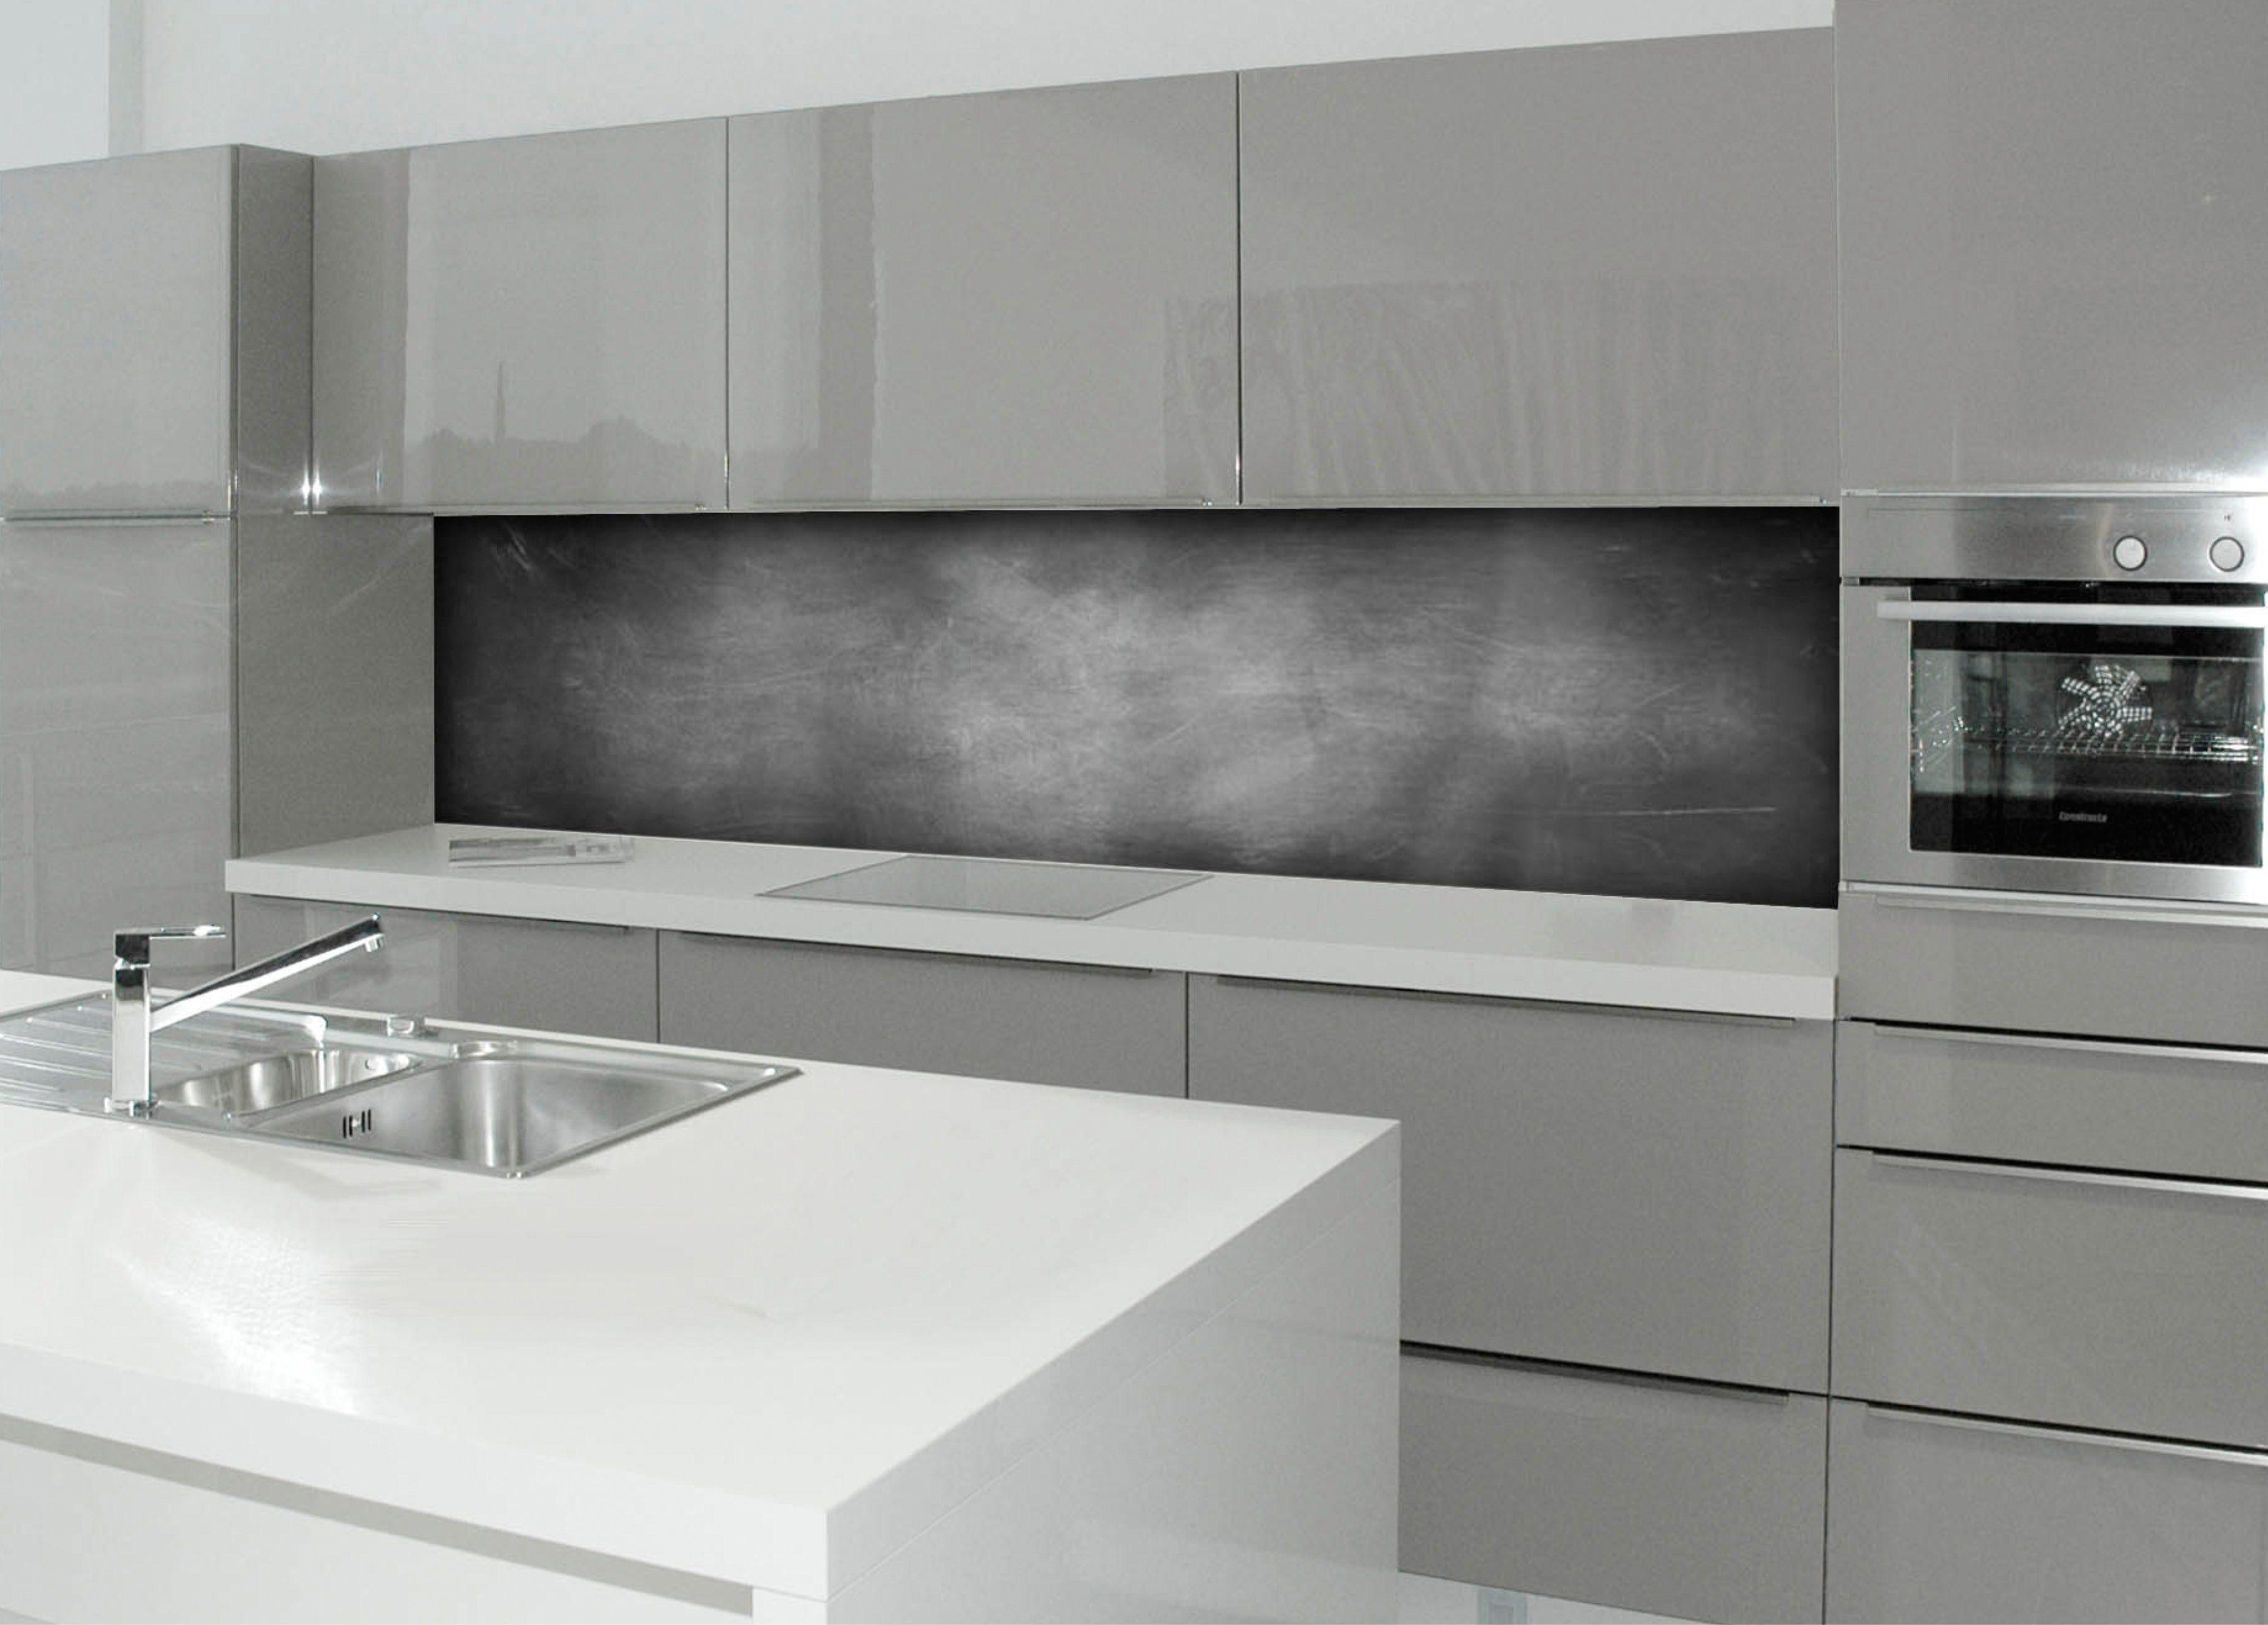 Küchenrückwand Spritzschutz profix , Tafel, 220×60 cm online kaufen OTTO